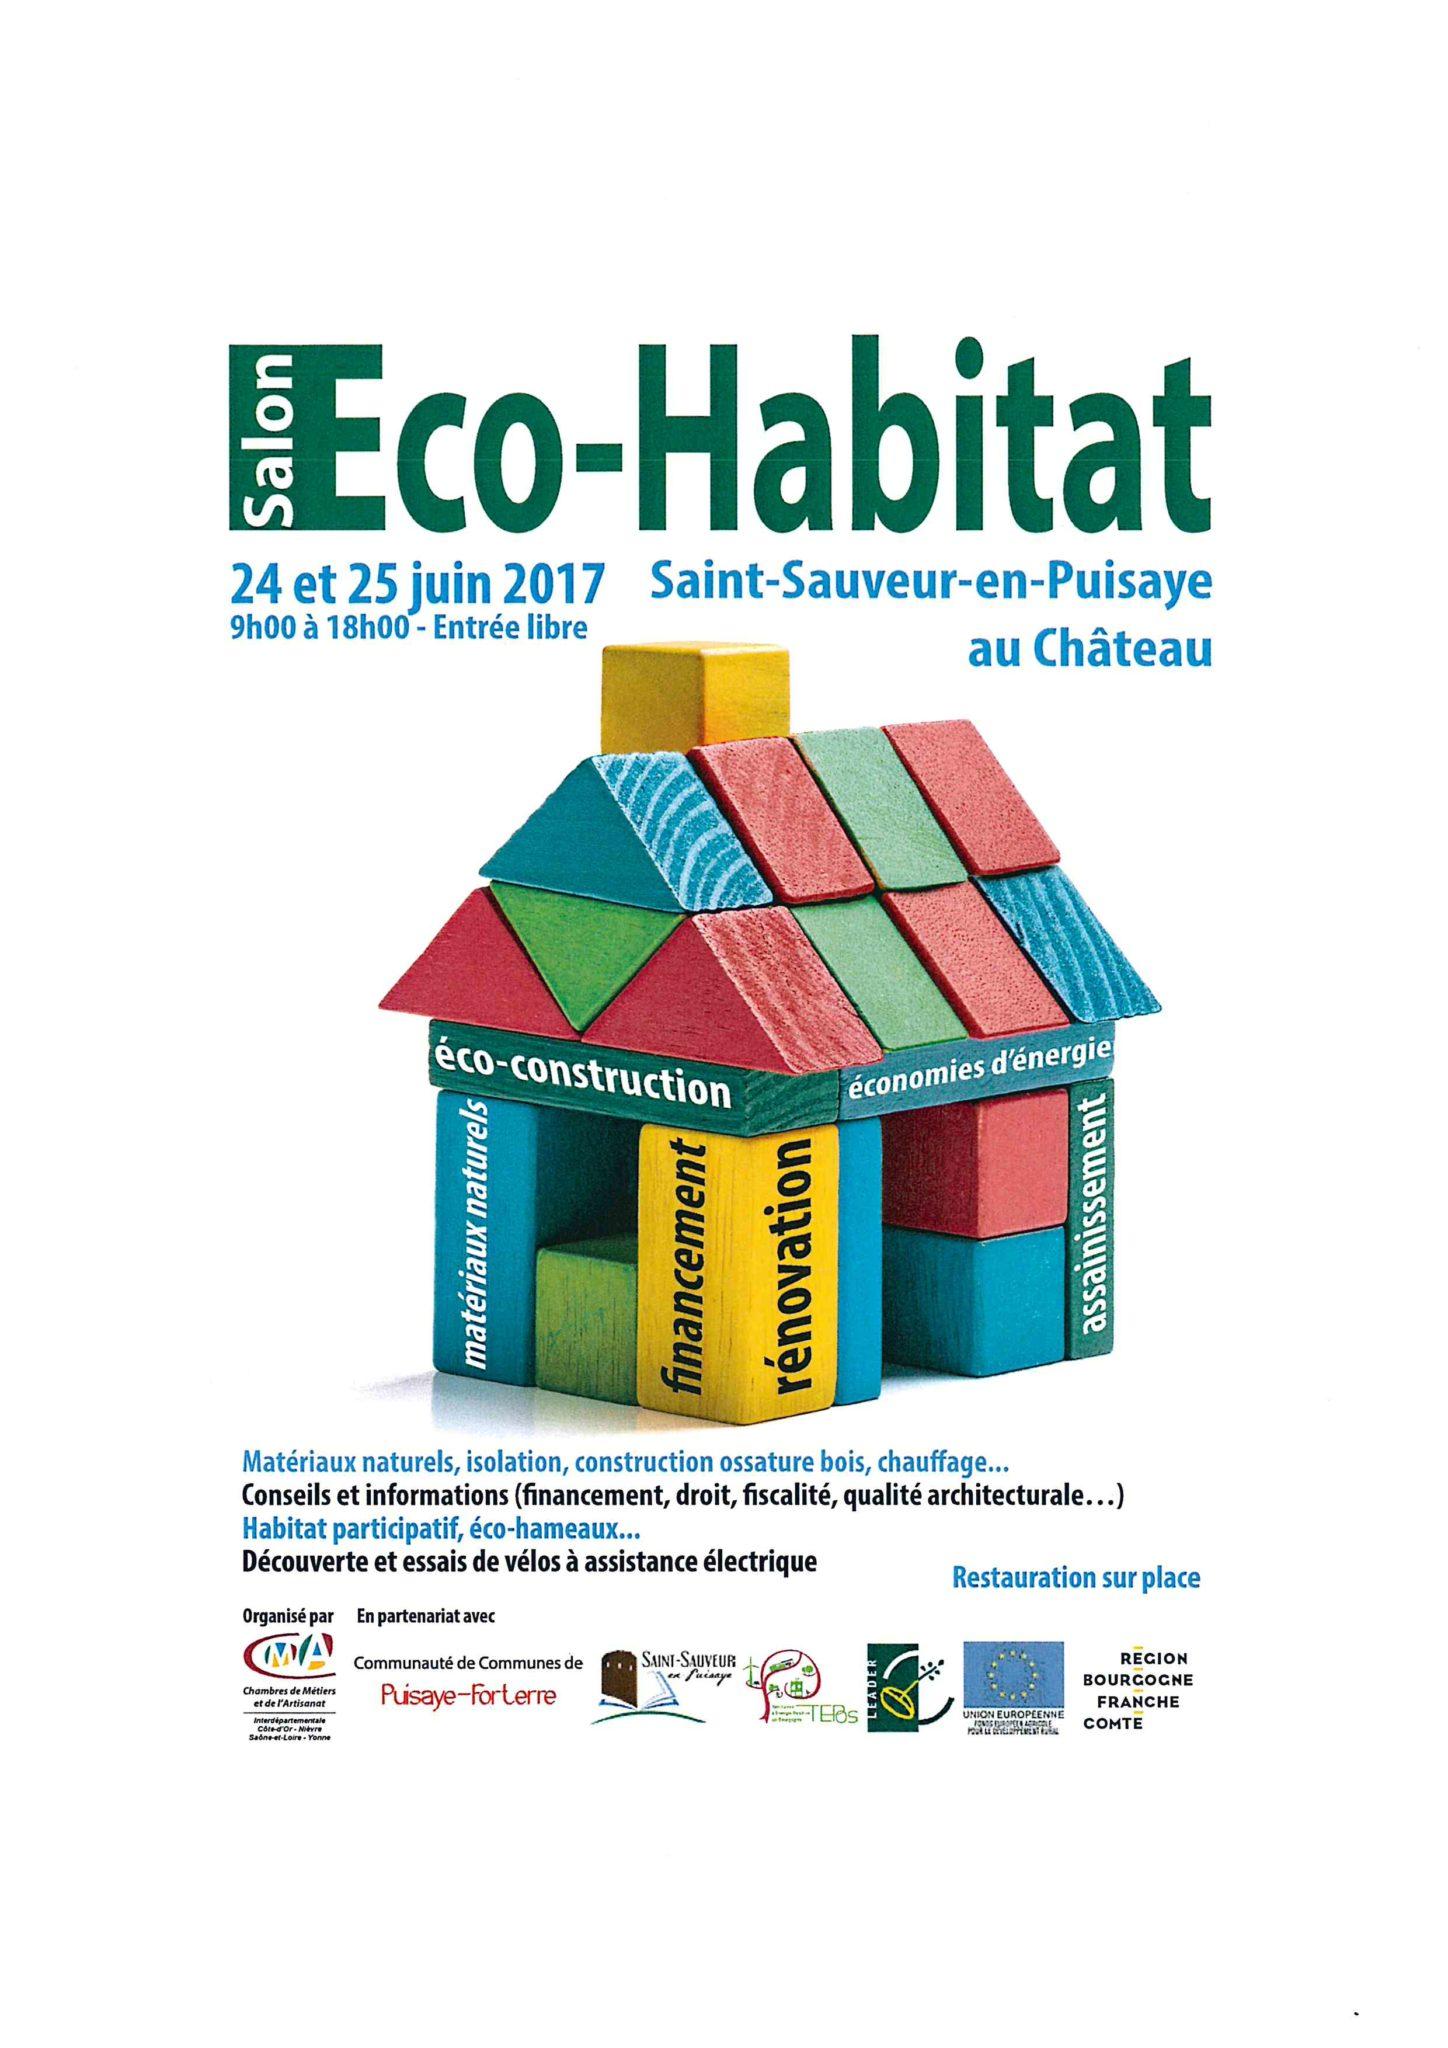 Salon eco habitat saint sauveur en puisaye for Salon eco habitat